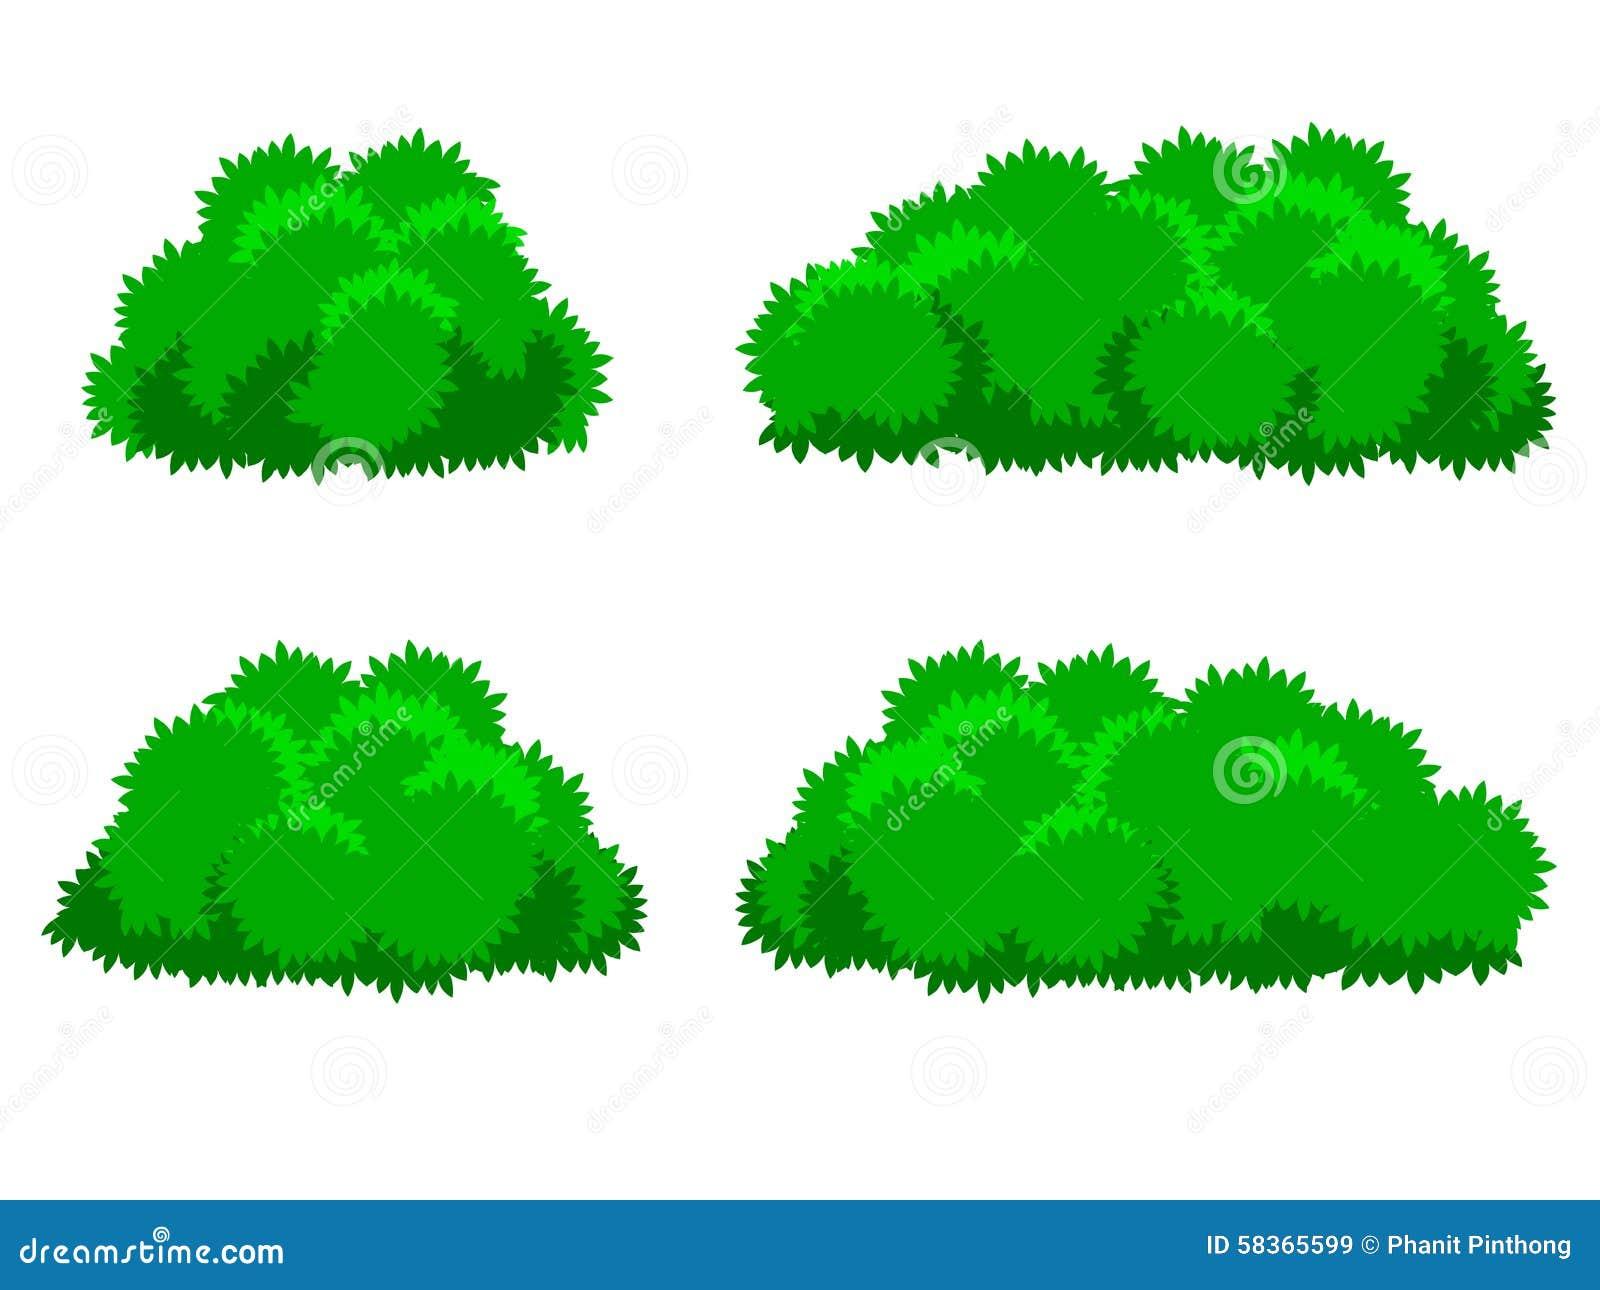 Bush Plant Images & Stock Pictures. Royalty Free Bush ...